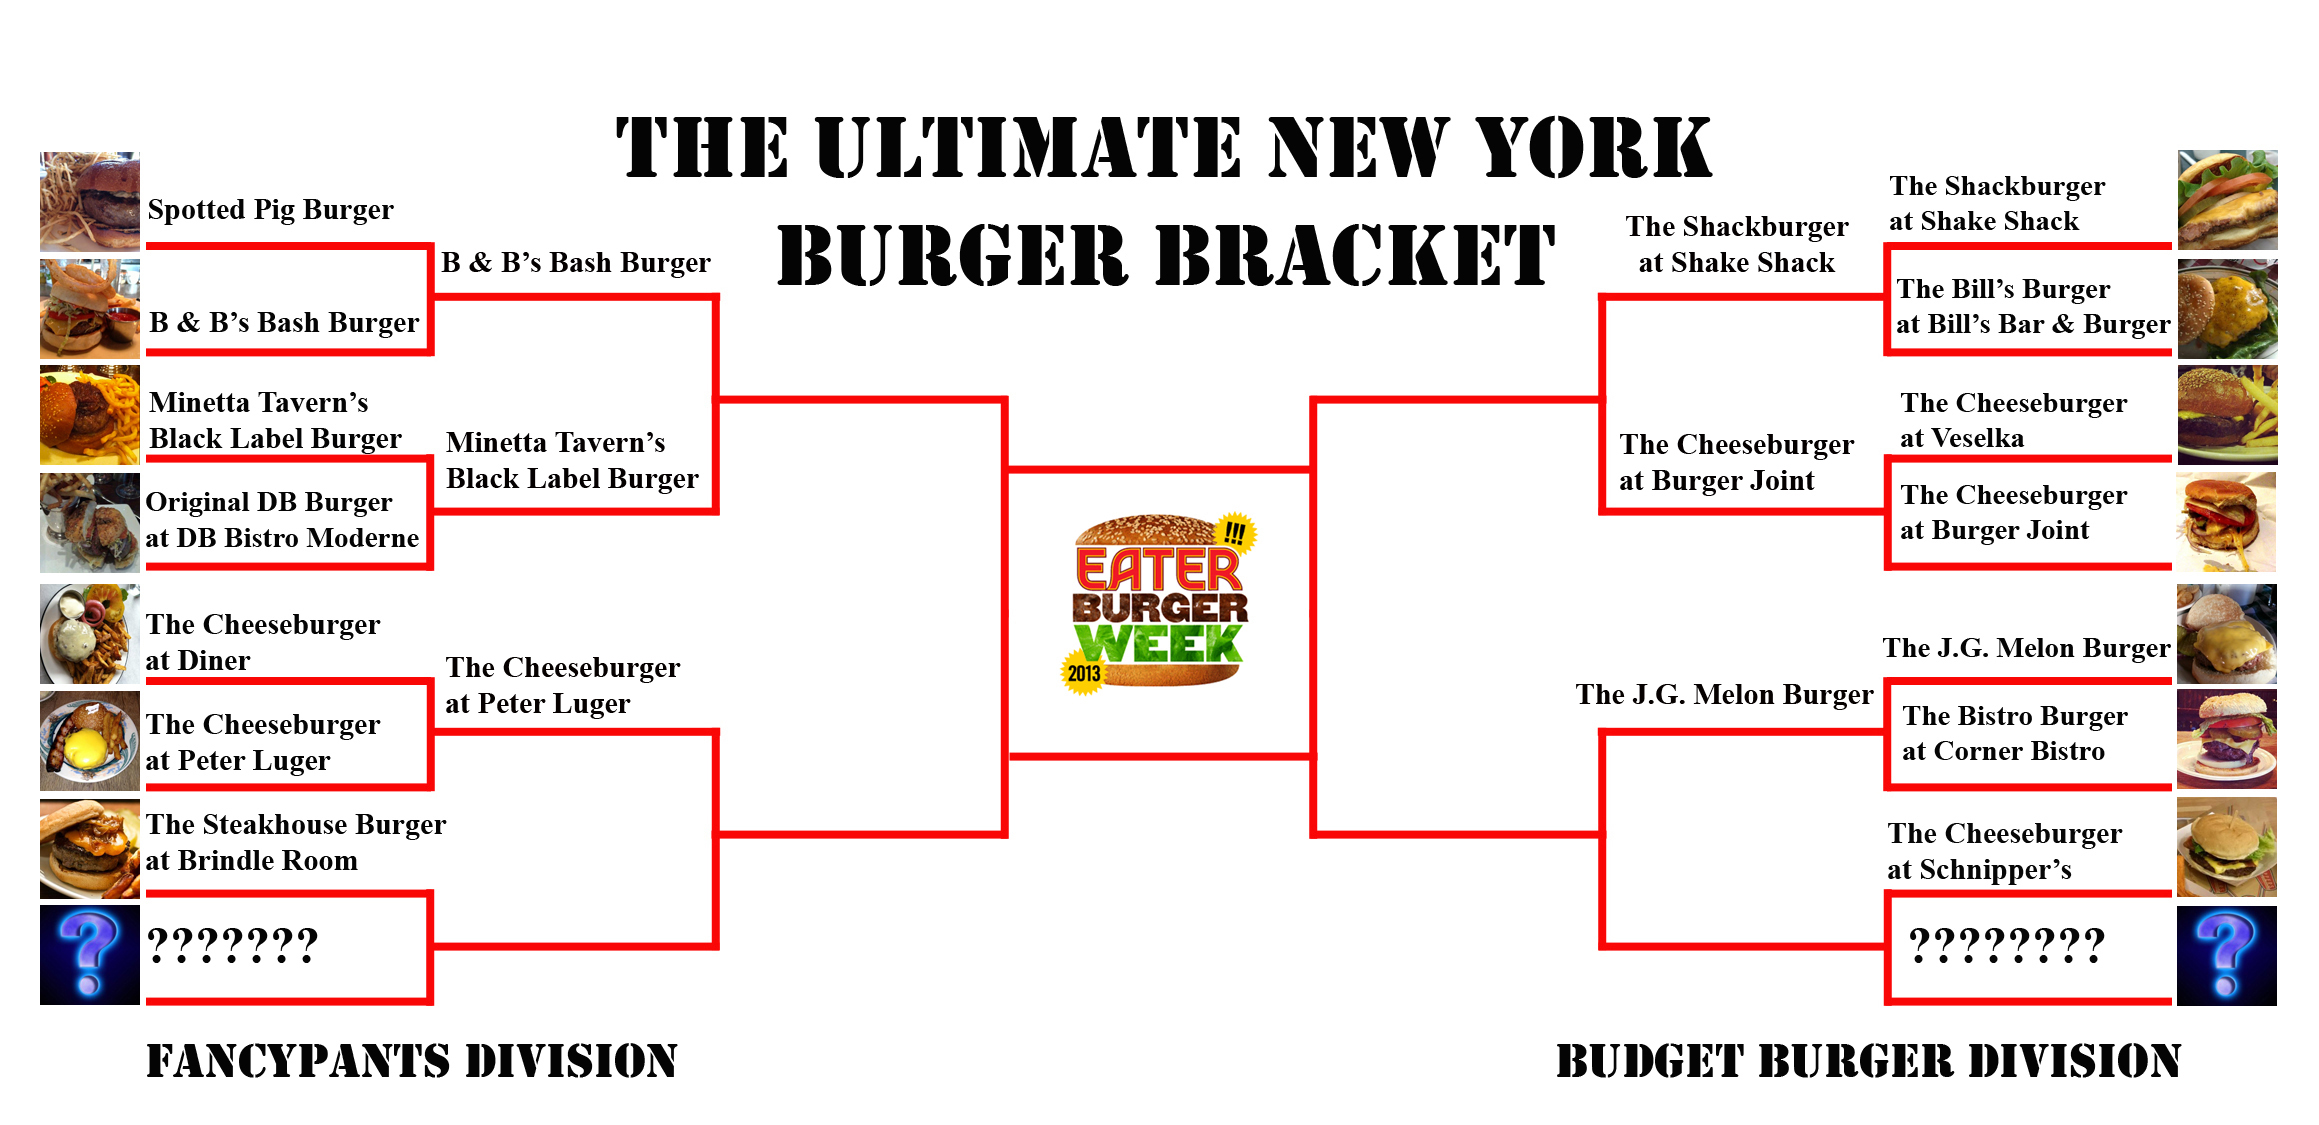 2013_burger_bracket_update_4.jpg